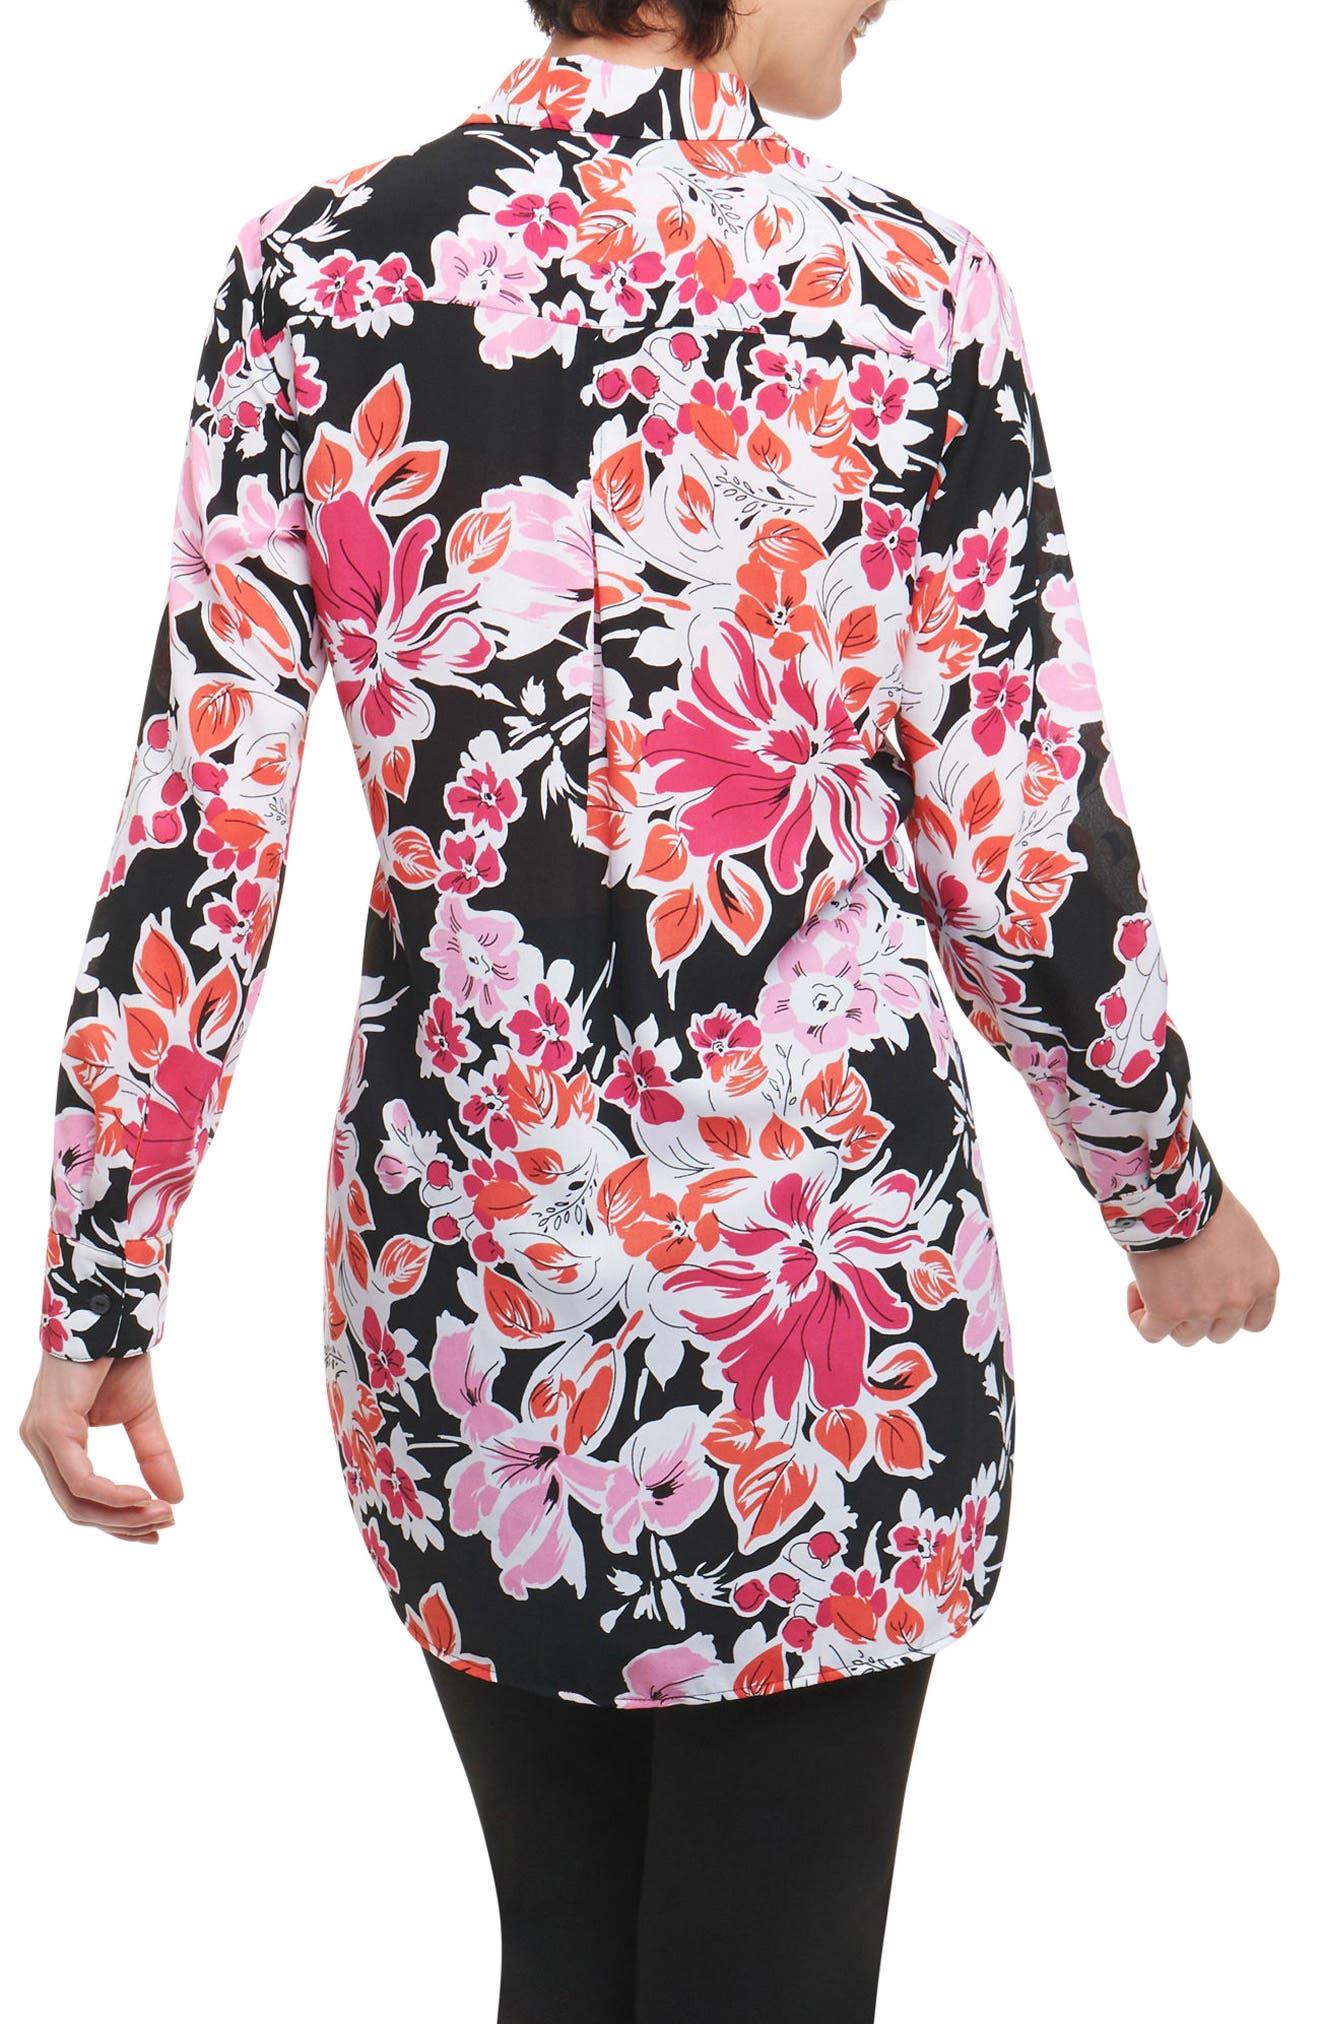 Jade Blooming Floral Tunic Shirt,                             Alternate thumbnail 2, color,                             003